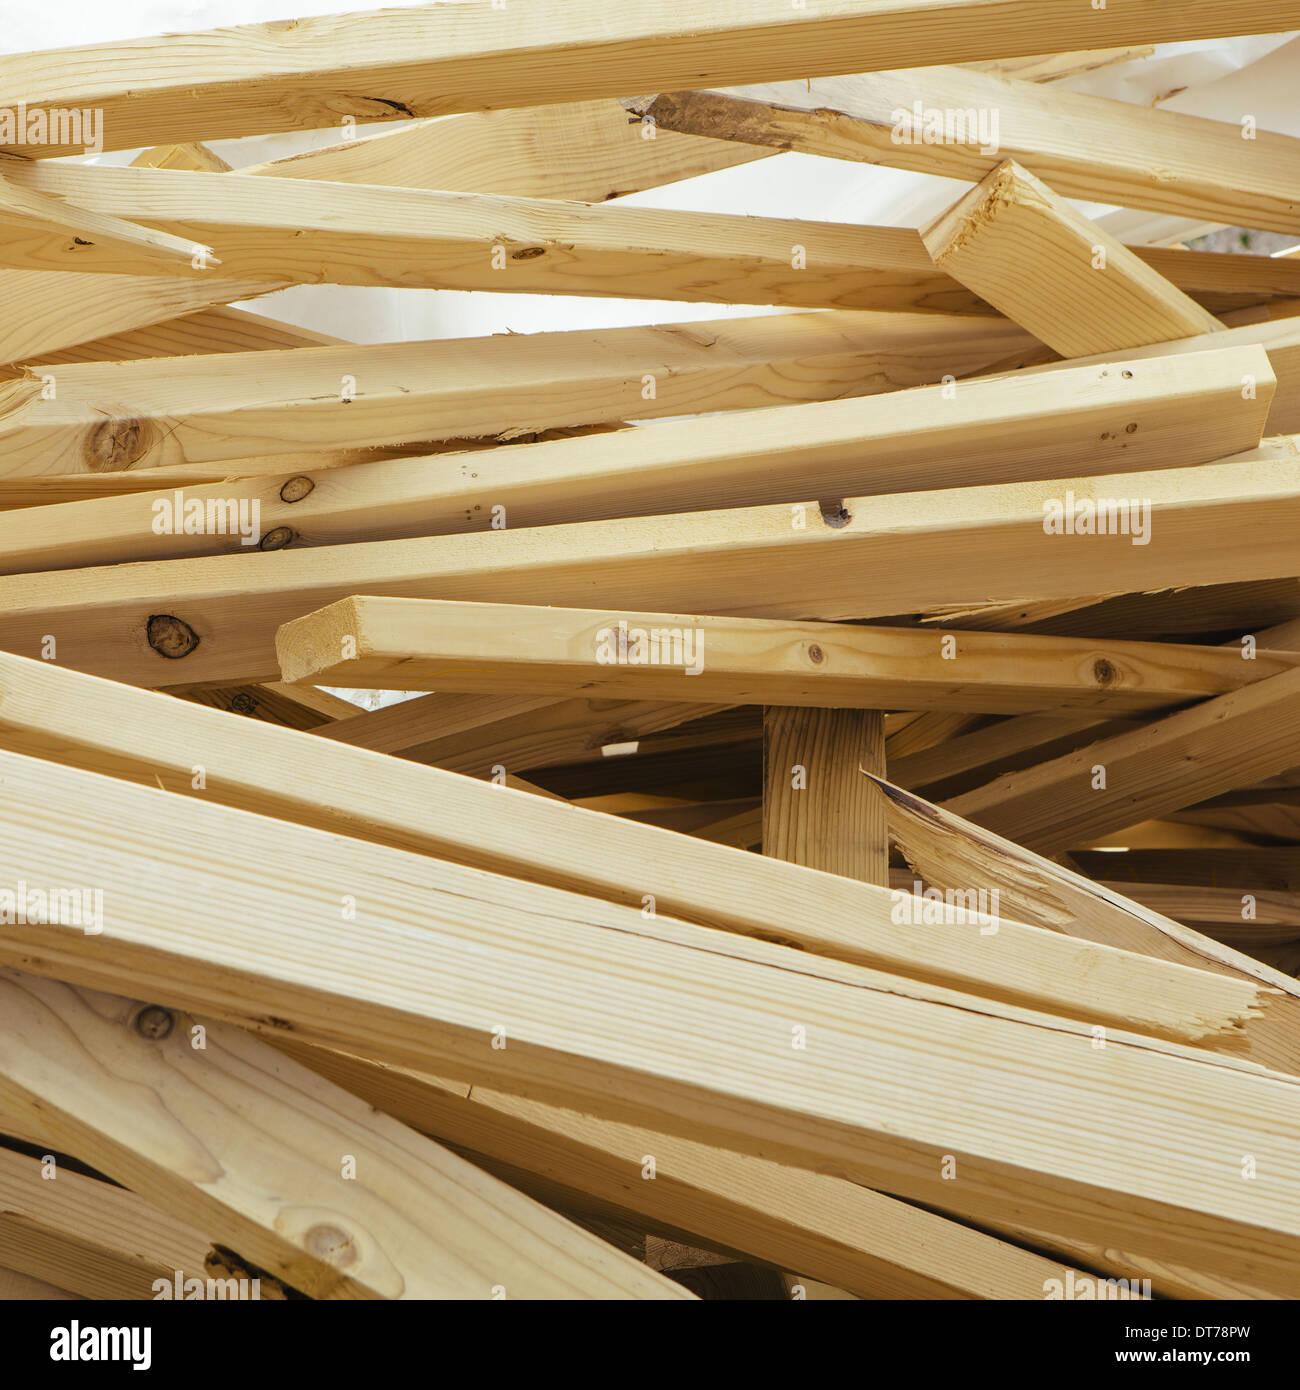 Construction Wood Pile Stockfotos & Construction Wood Pile Bilder ...